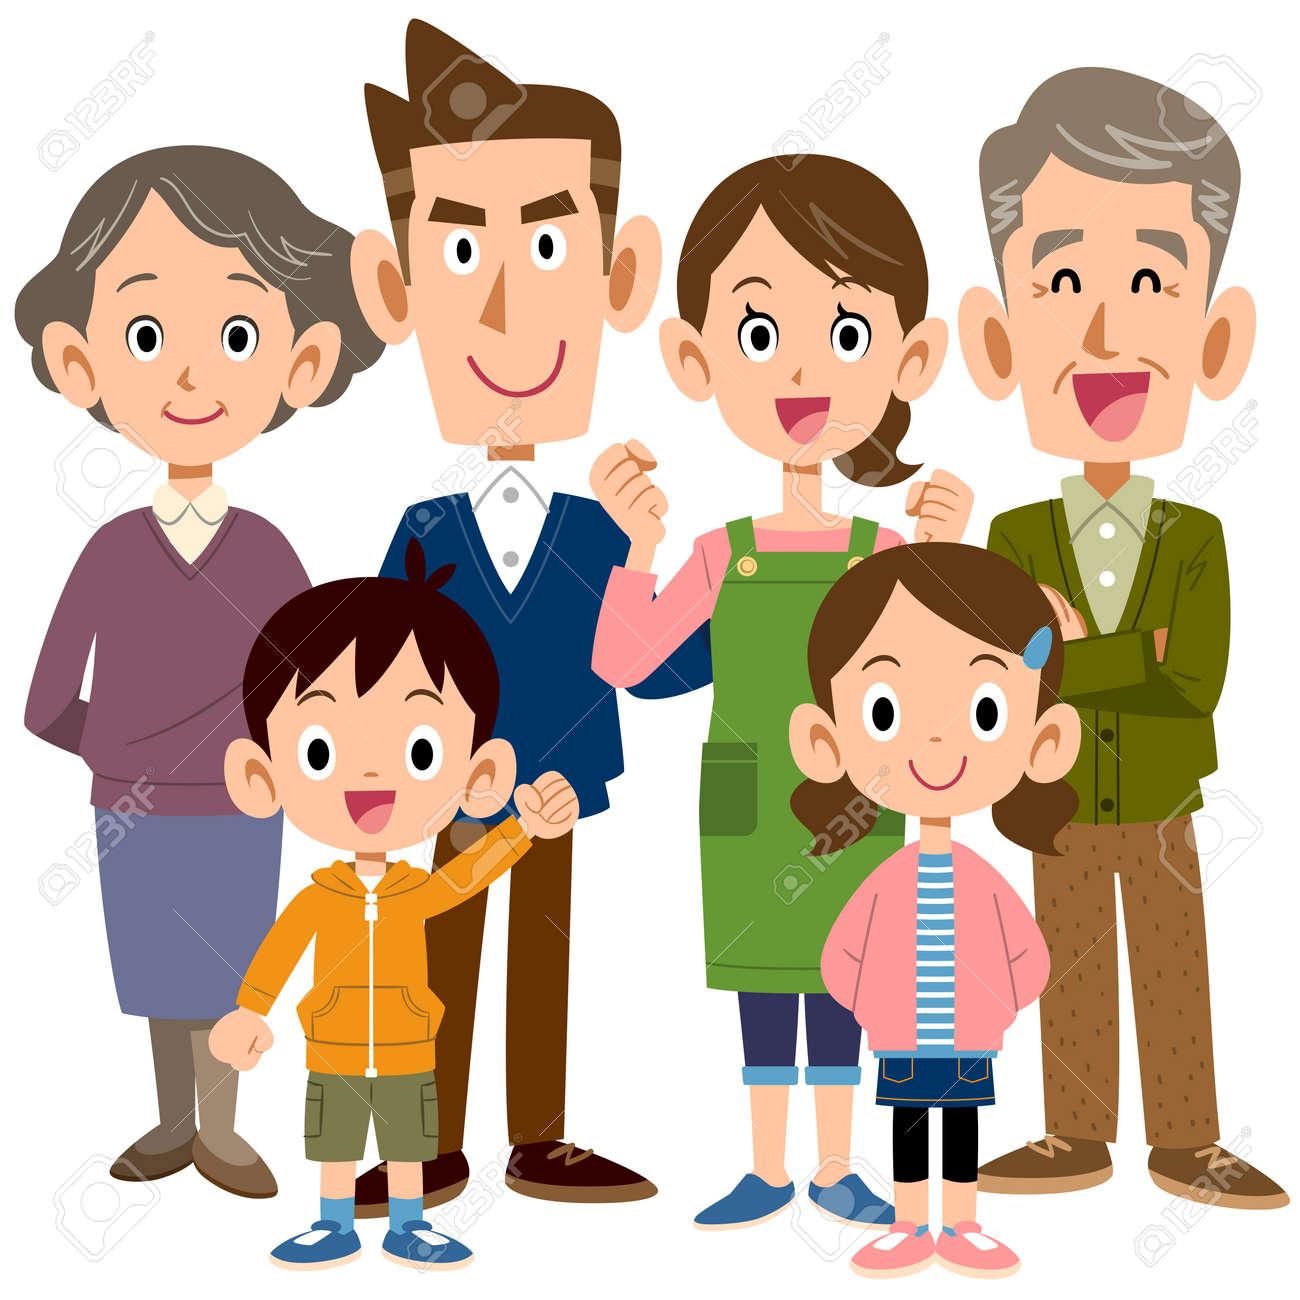 6 person family - 55045793